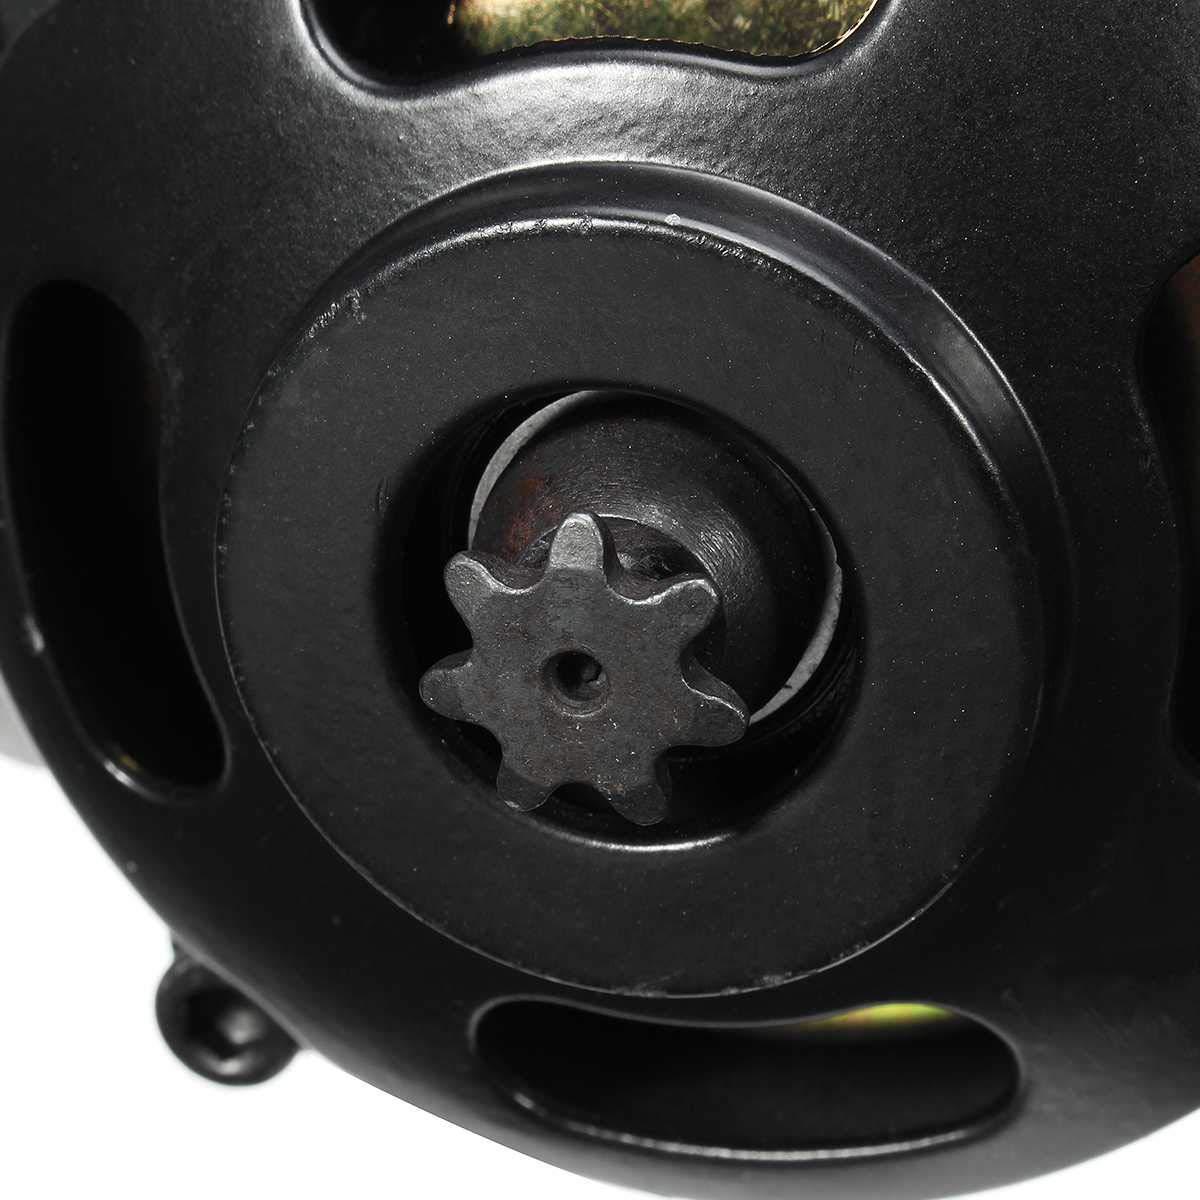 49cc 2-Stroke CDI Hand Pull Start Engine Motor For Pocket Bike Mini Dirt Bike ATV Scooter by Unkows (Image #6)